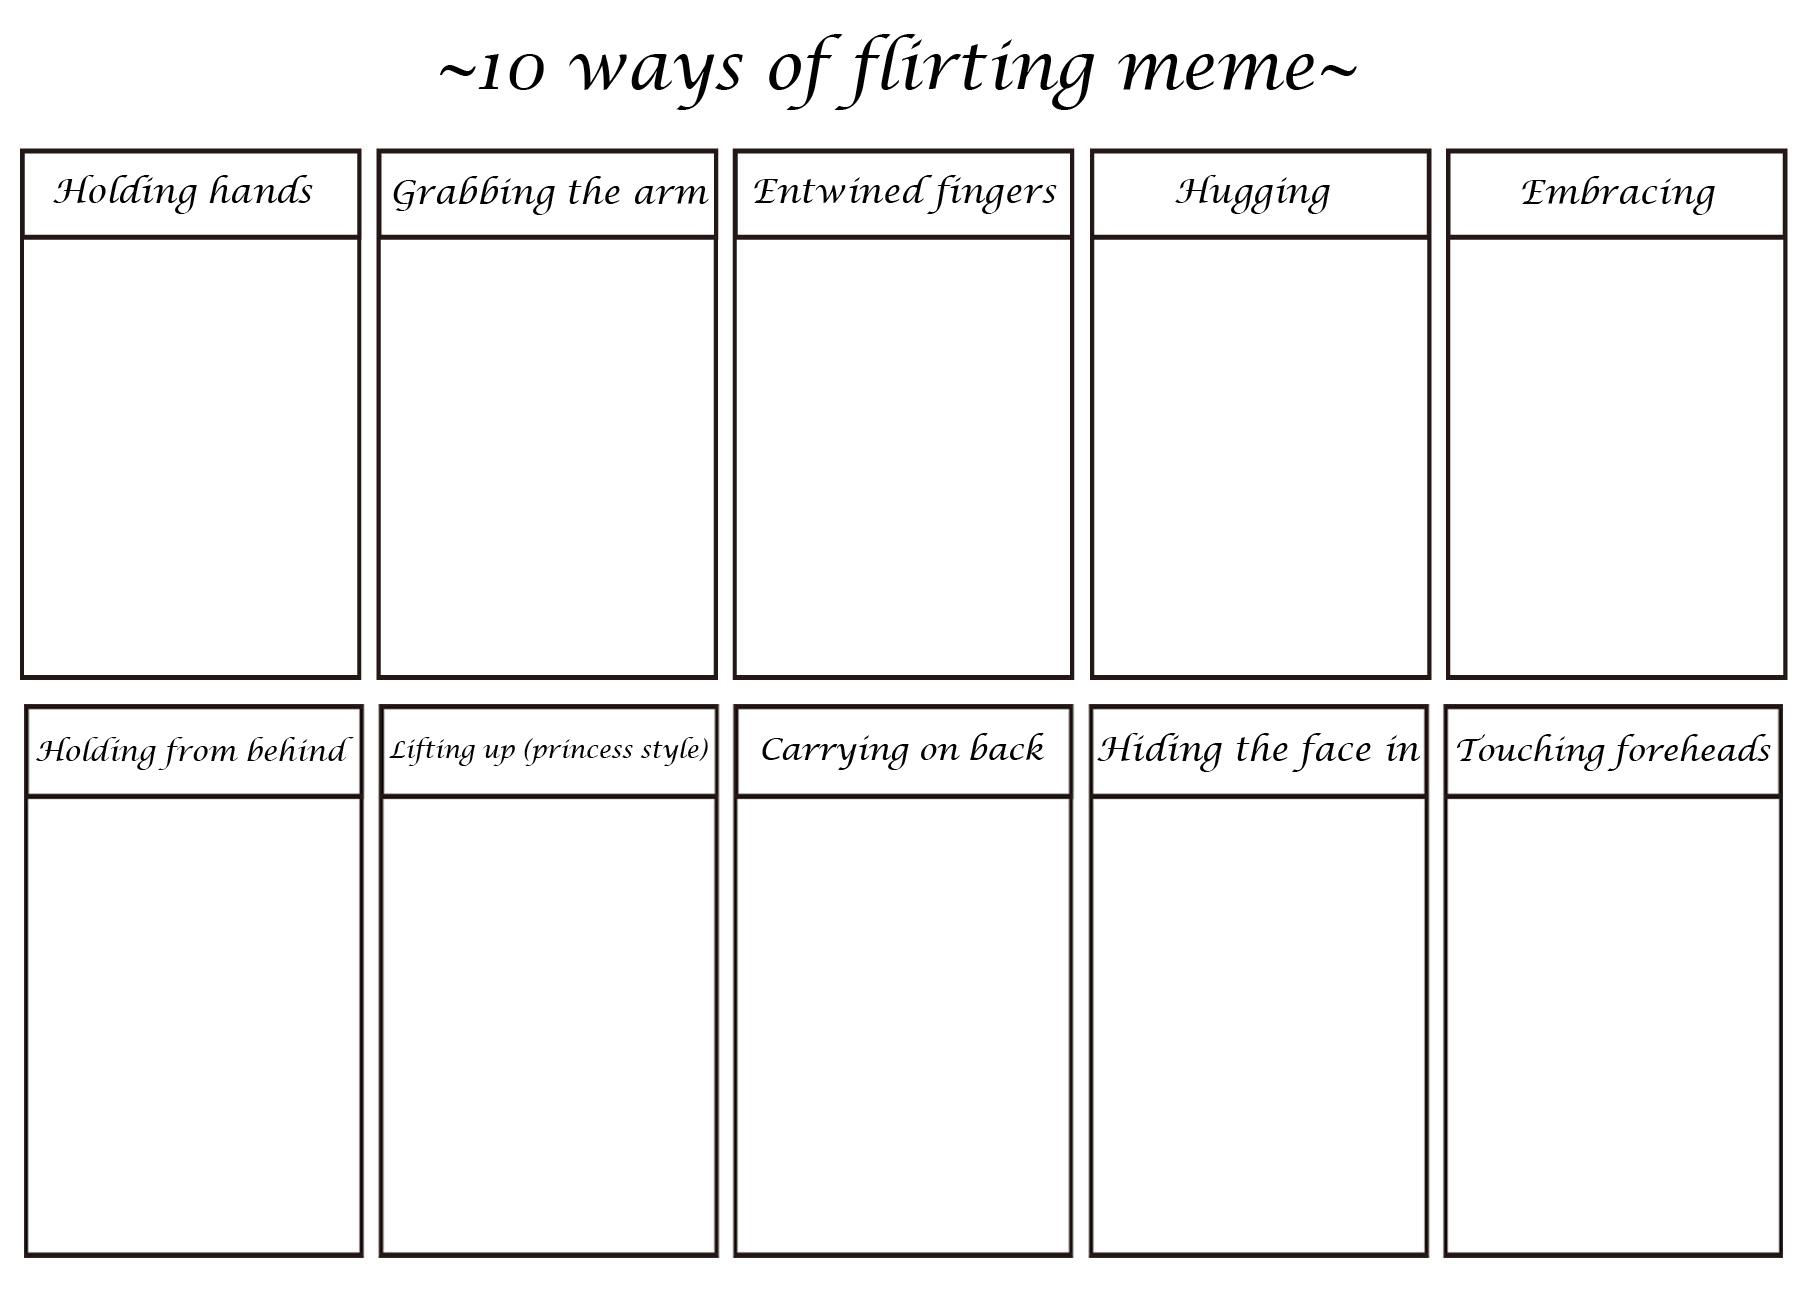 c2e 10 ways of flirting meme expression meme know your meme